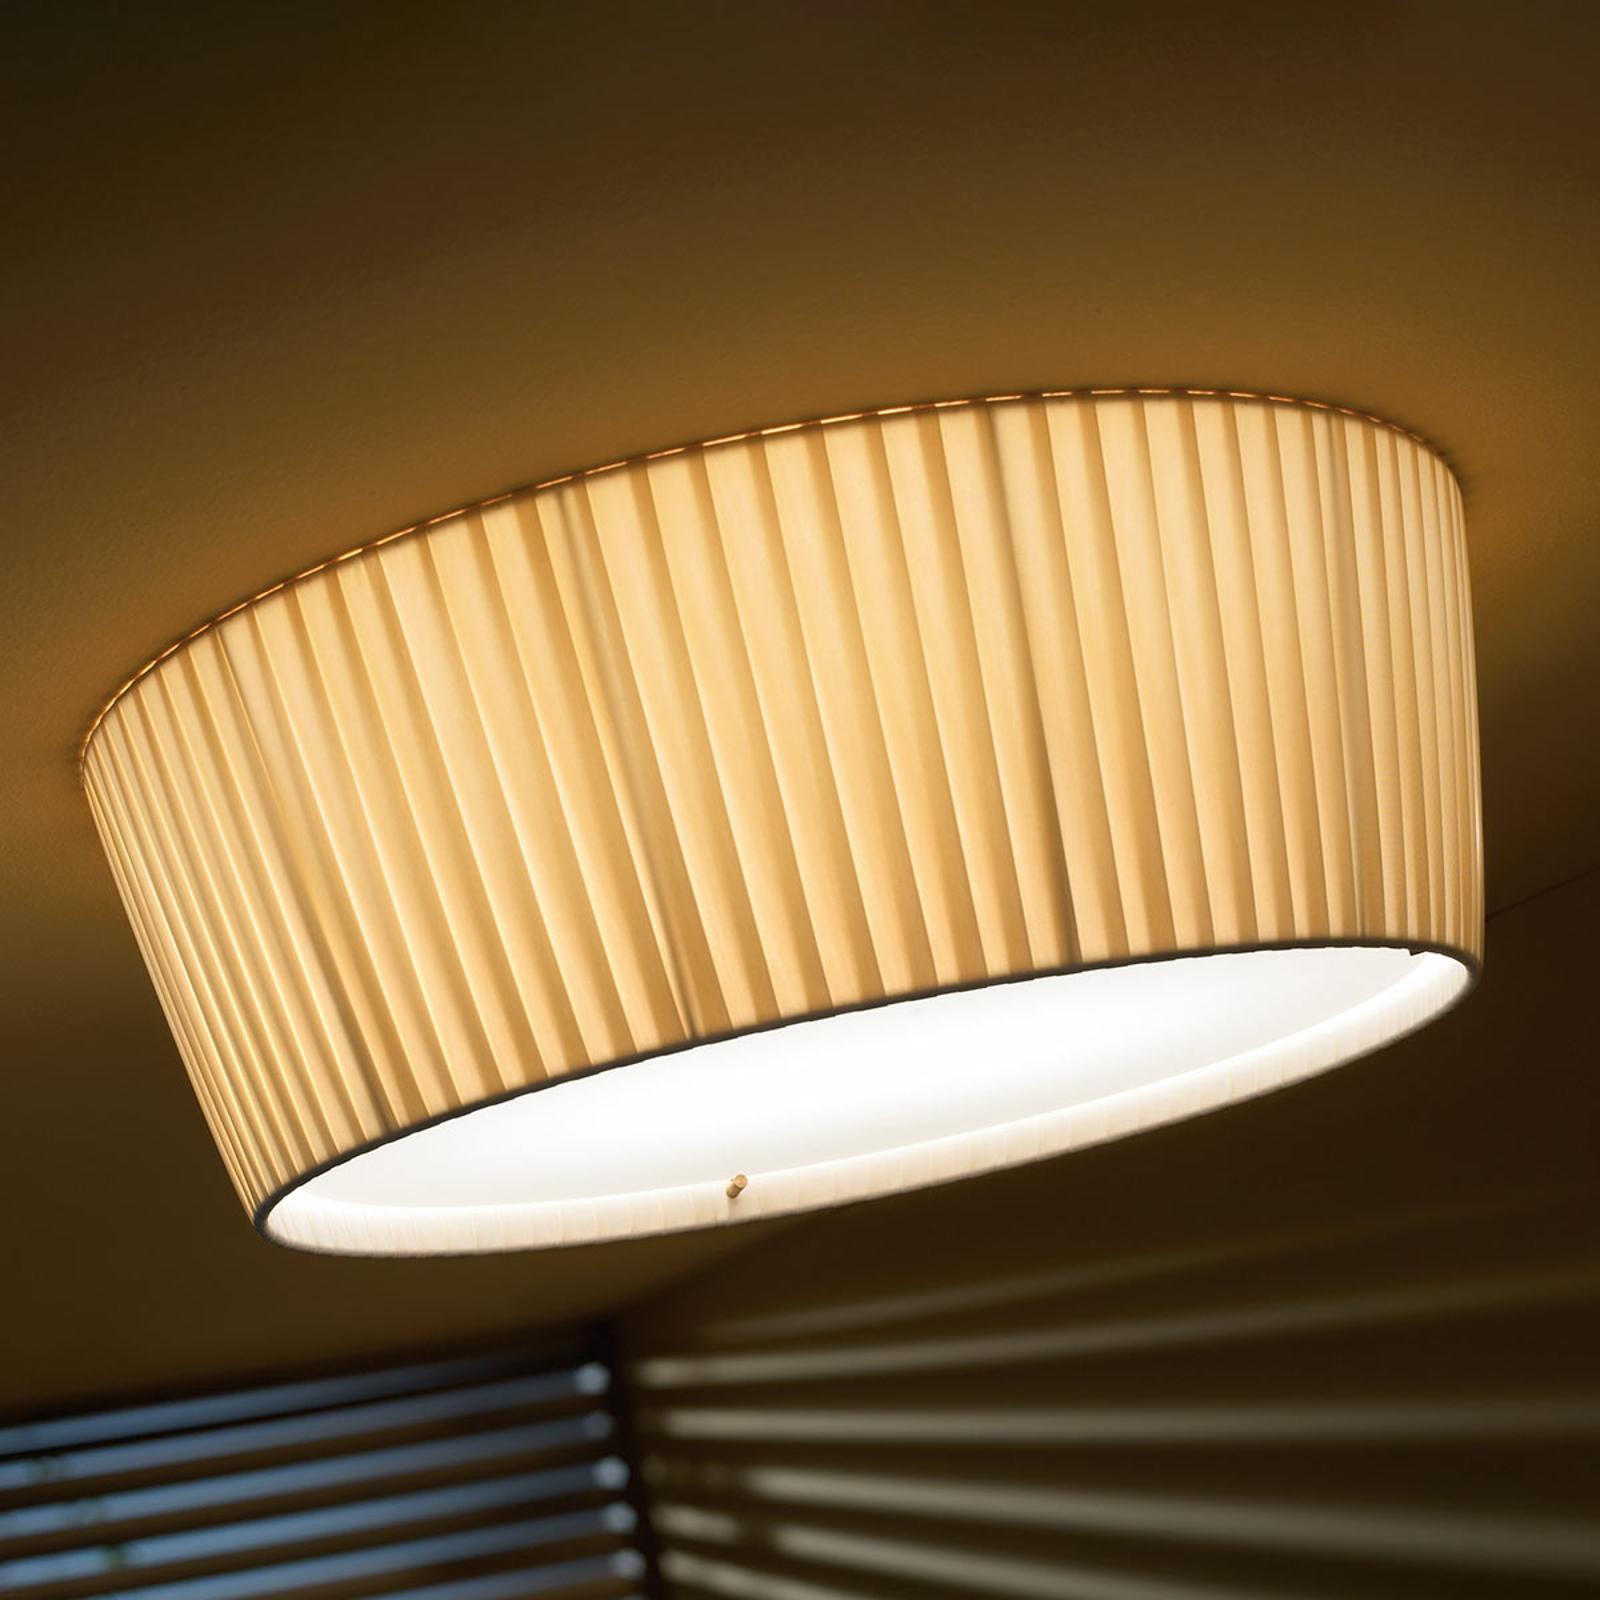 Bover Plafonet 43 - stoff-taklampe, bånd krem